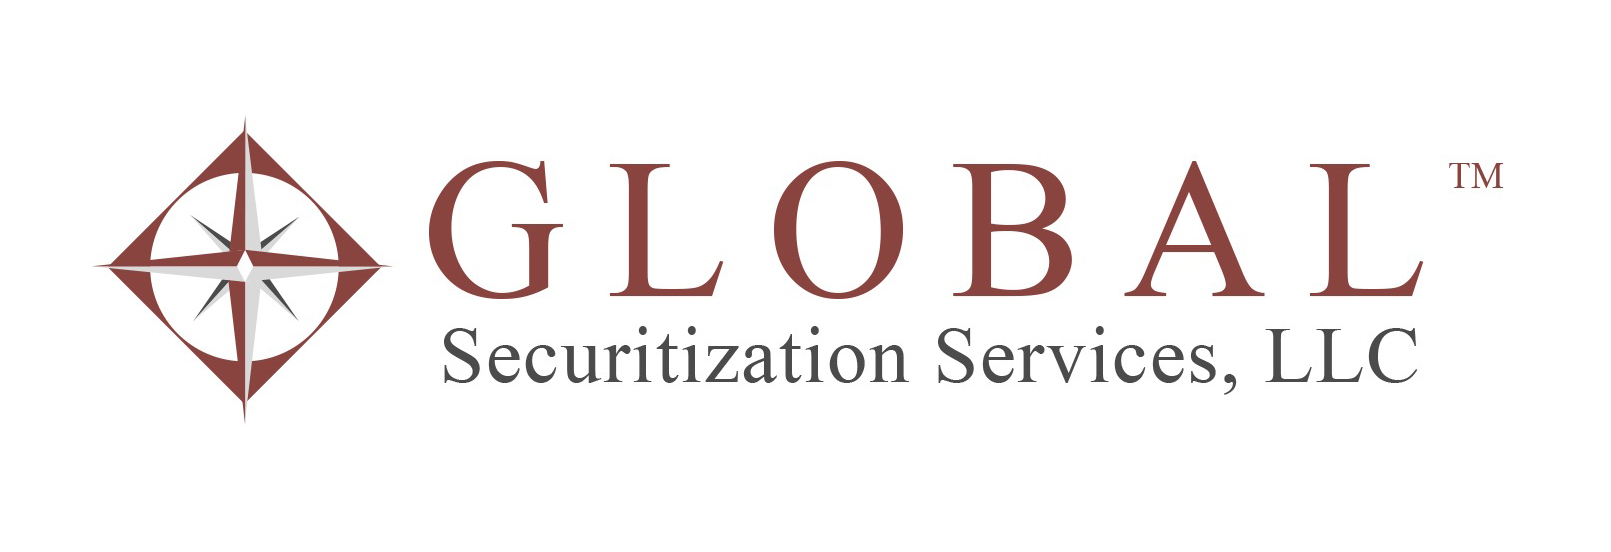 Global Securitization Services LLC Logo